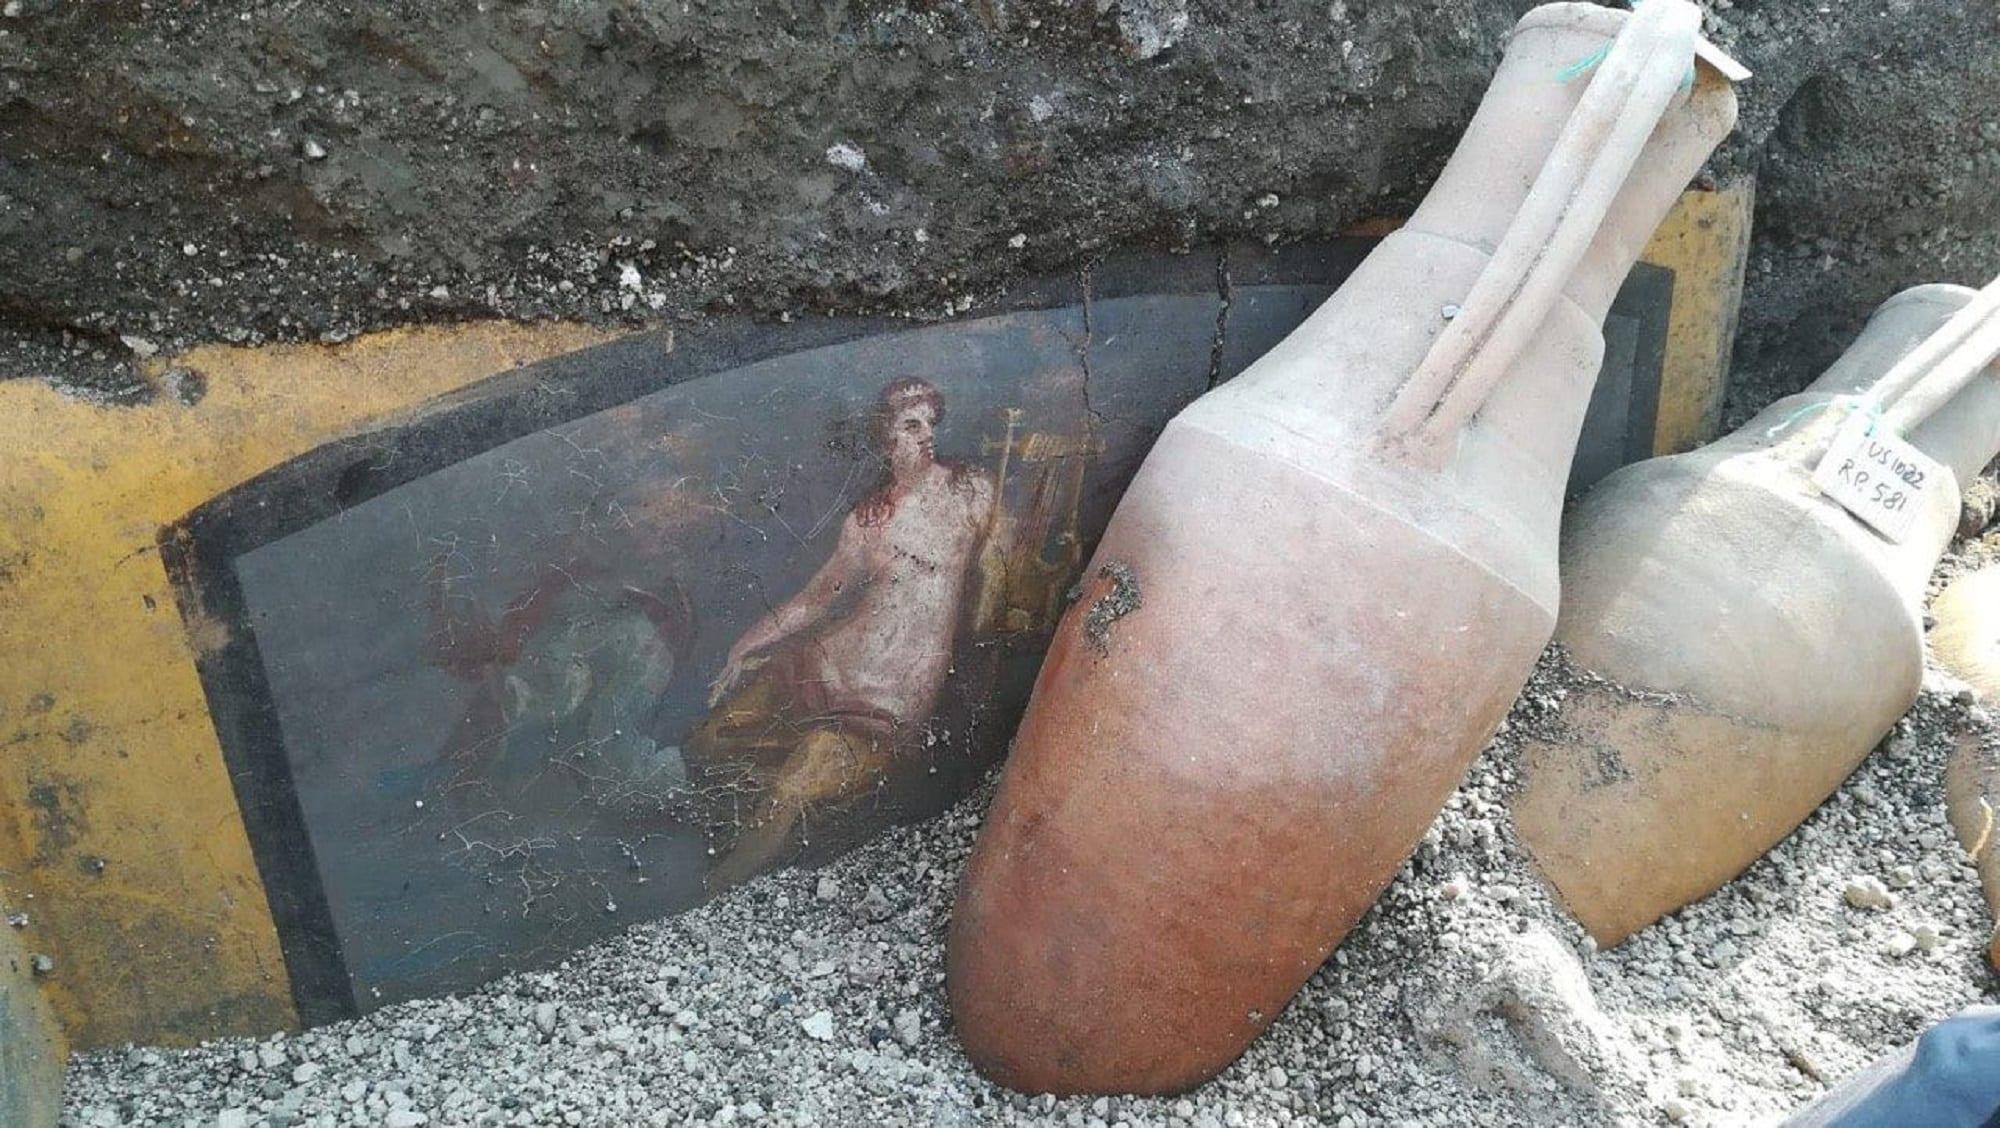 Una tavola calda (affrescata) di 2000 anni fa! Un'altra sensazionale scoperta a Pompei